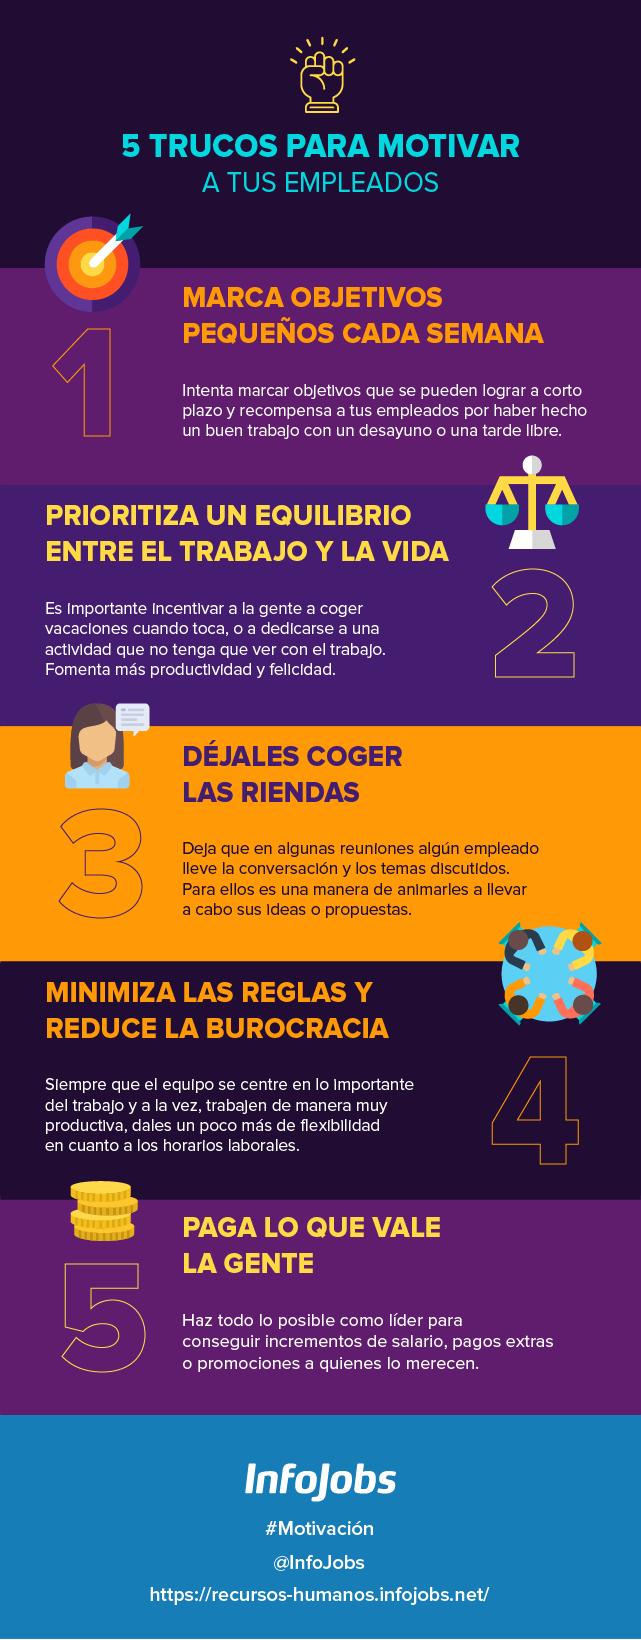 Motivación_consejos_trucos_empleados_infojobs